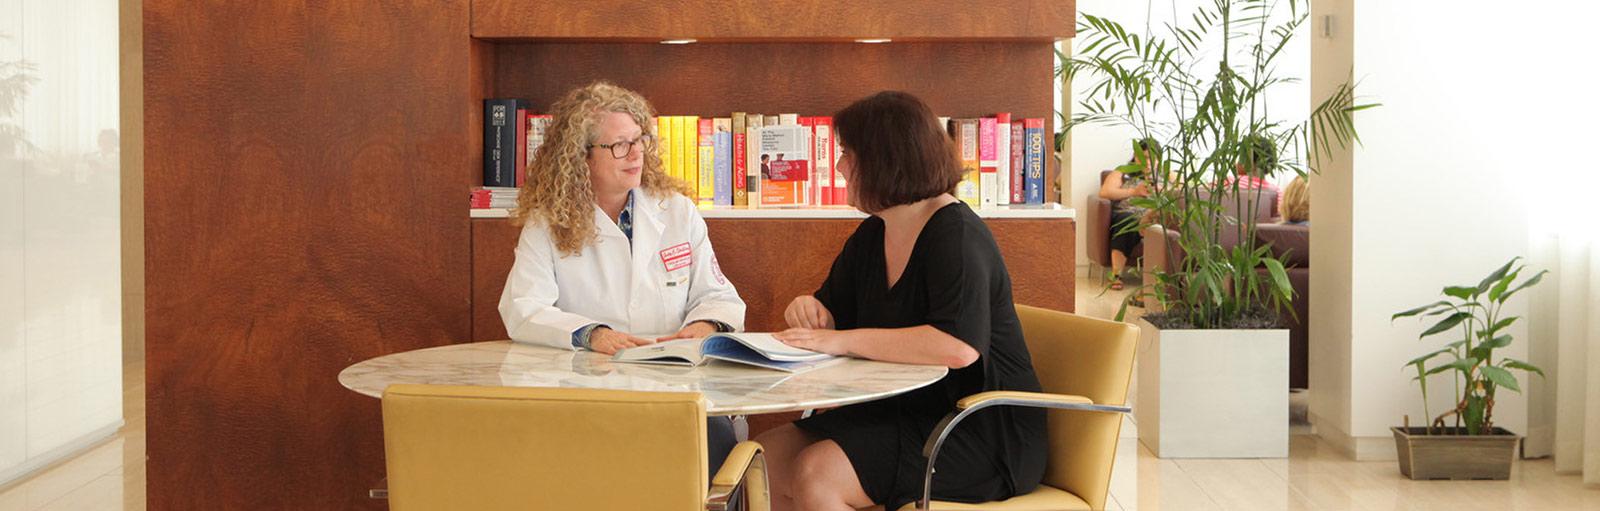 Myra Mahon Patient Resource Center